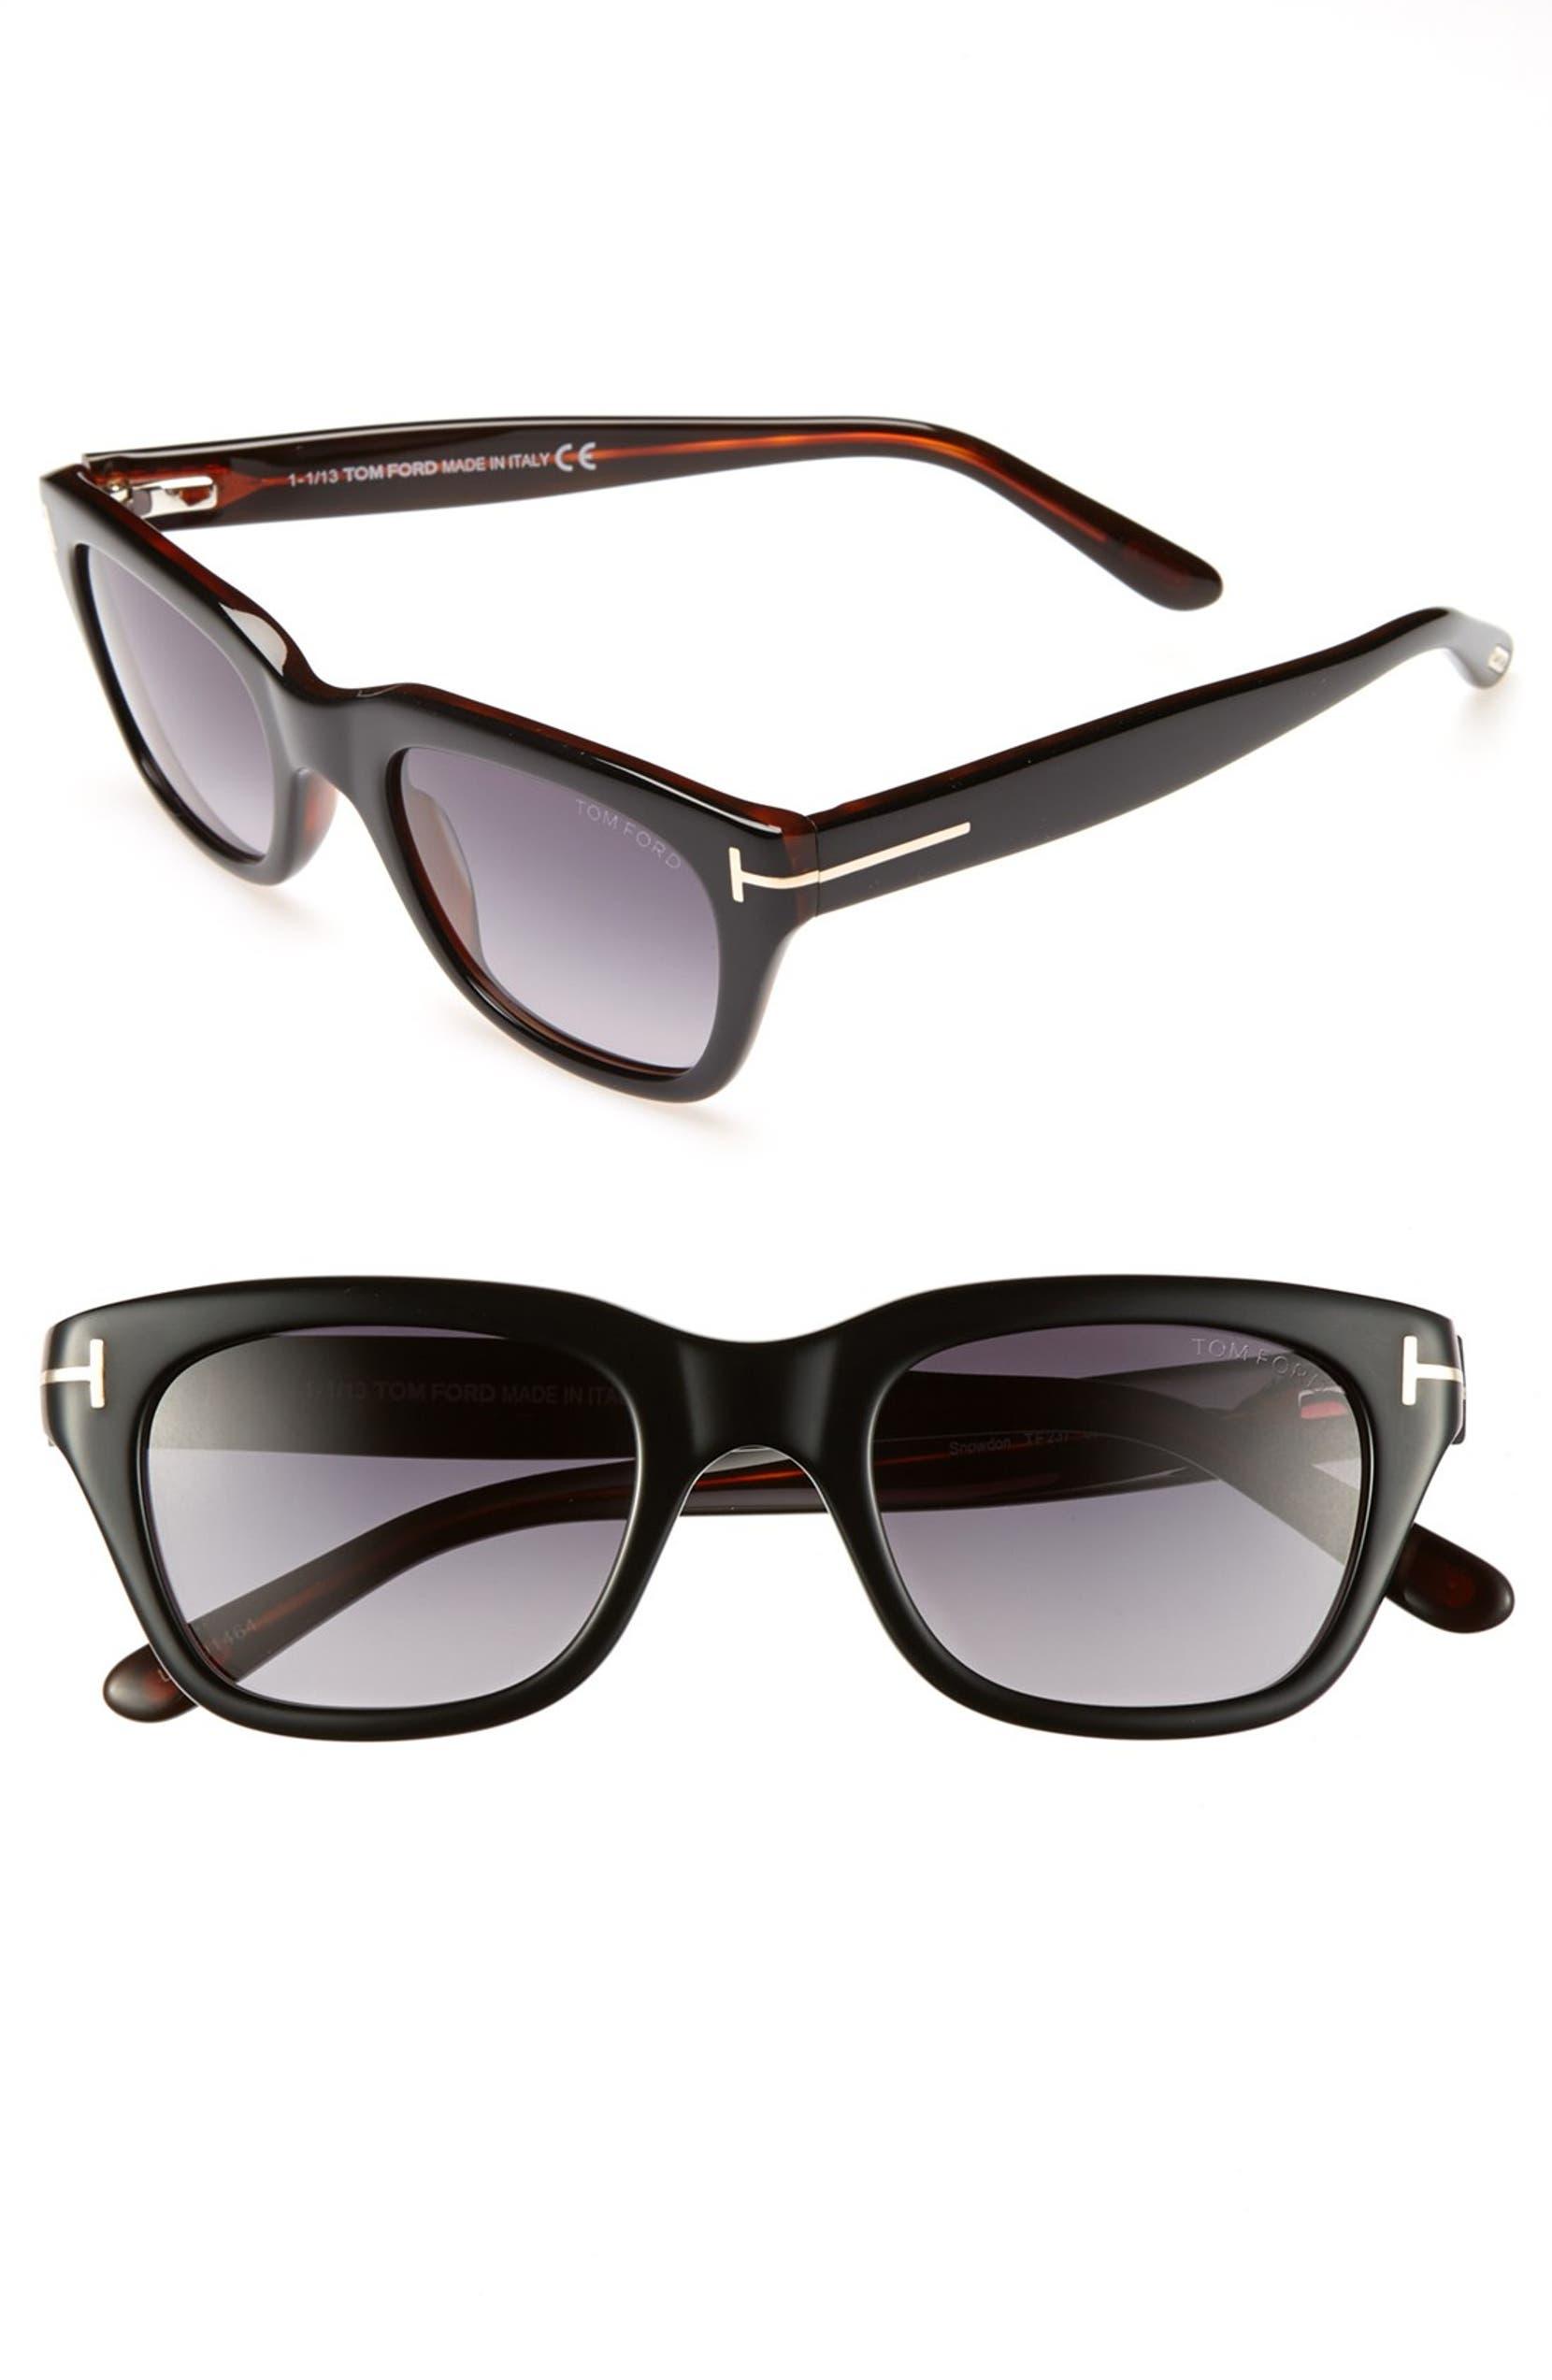 921352c998 Tom Ford  Snowdon  50mm Sunglasses